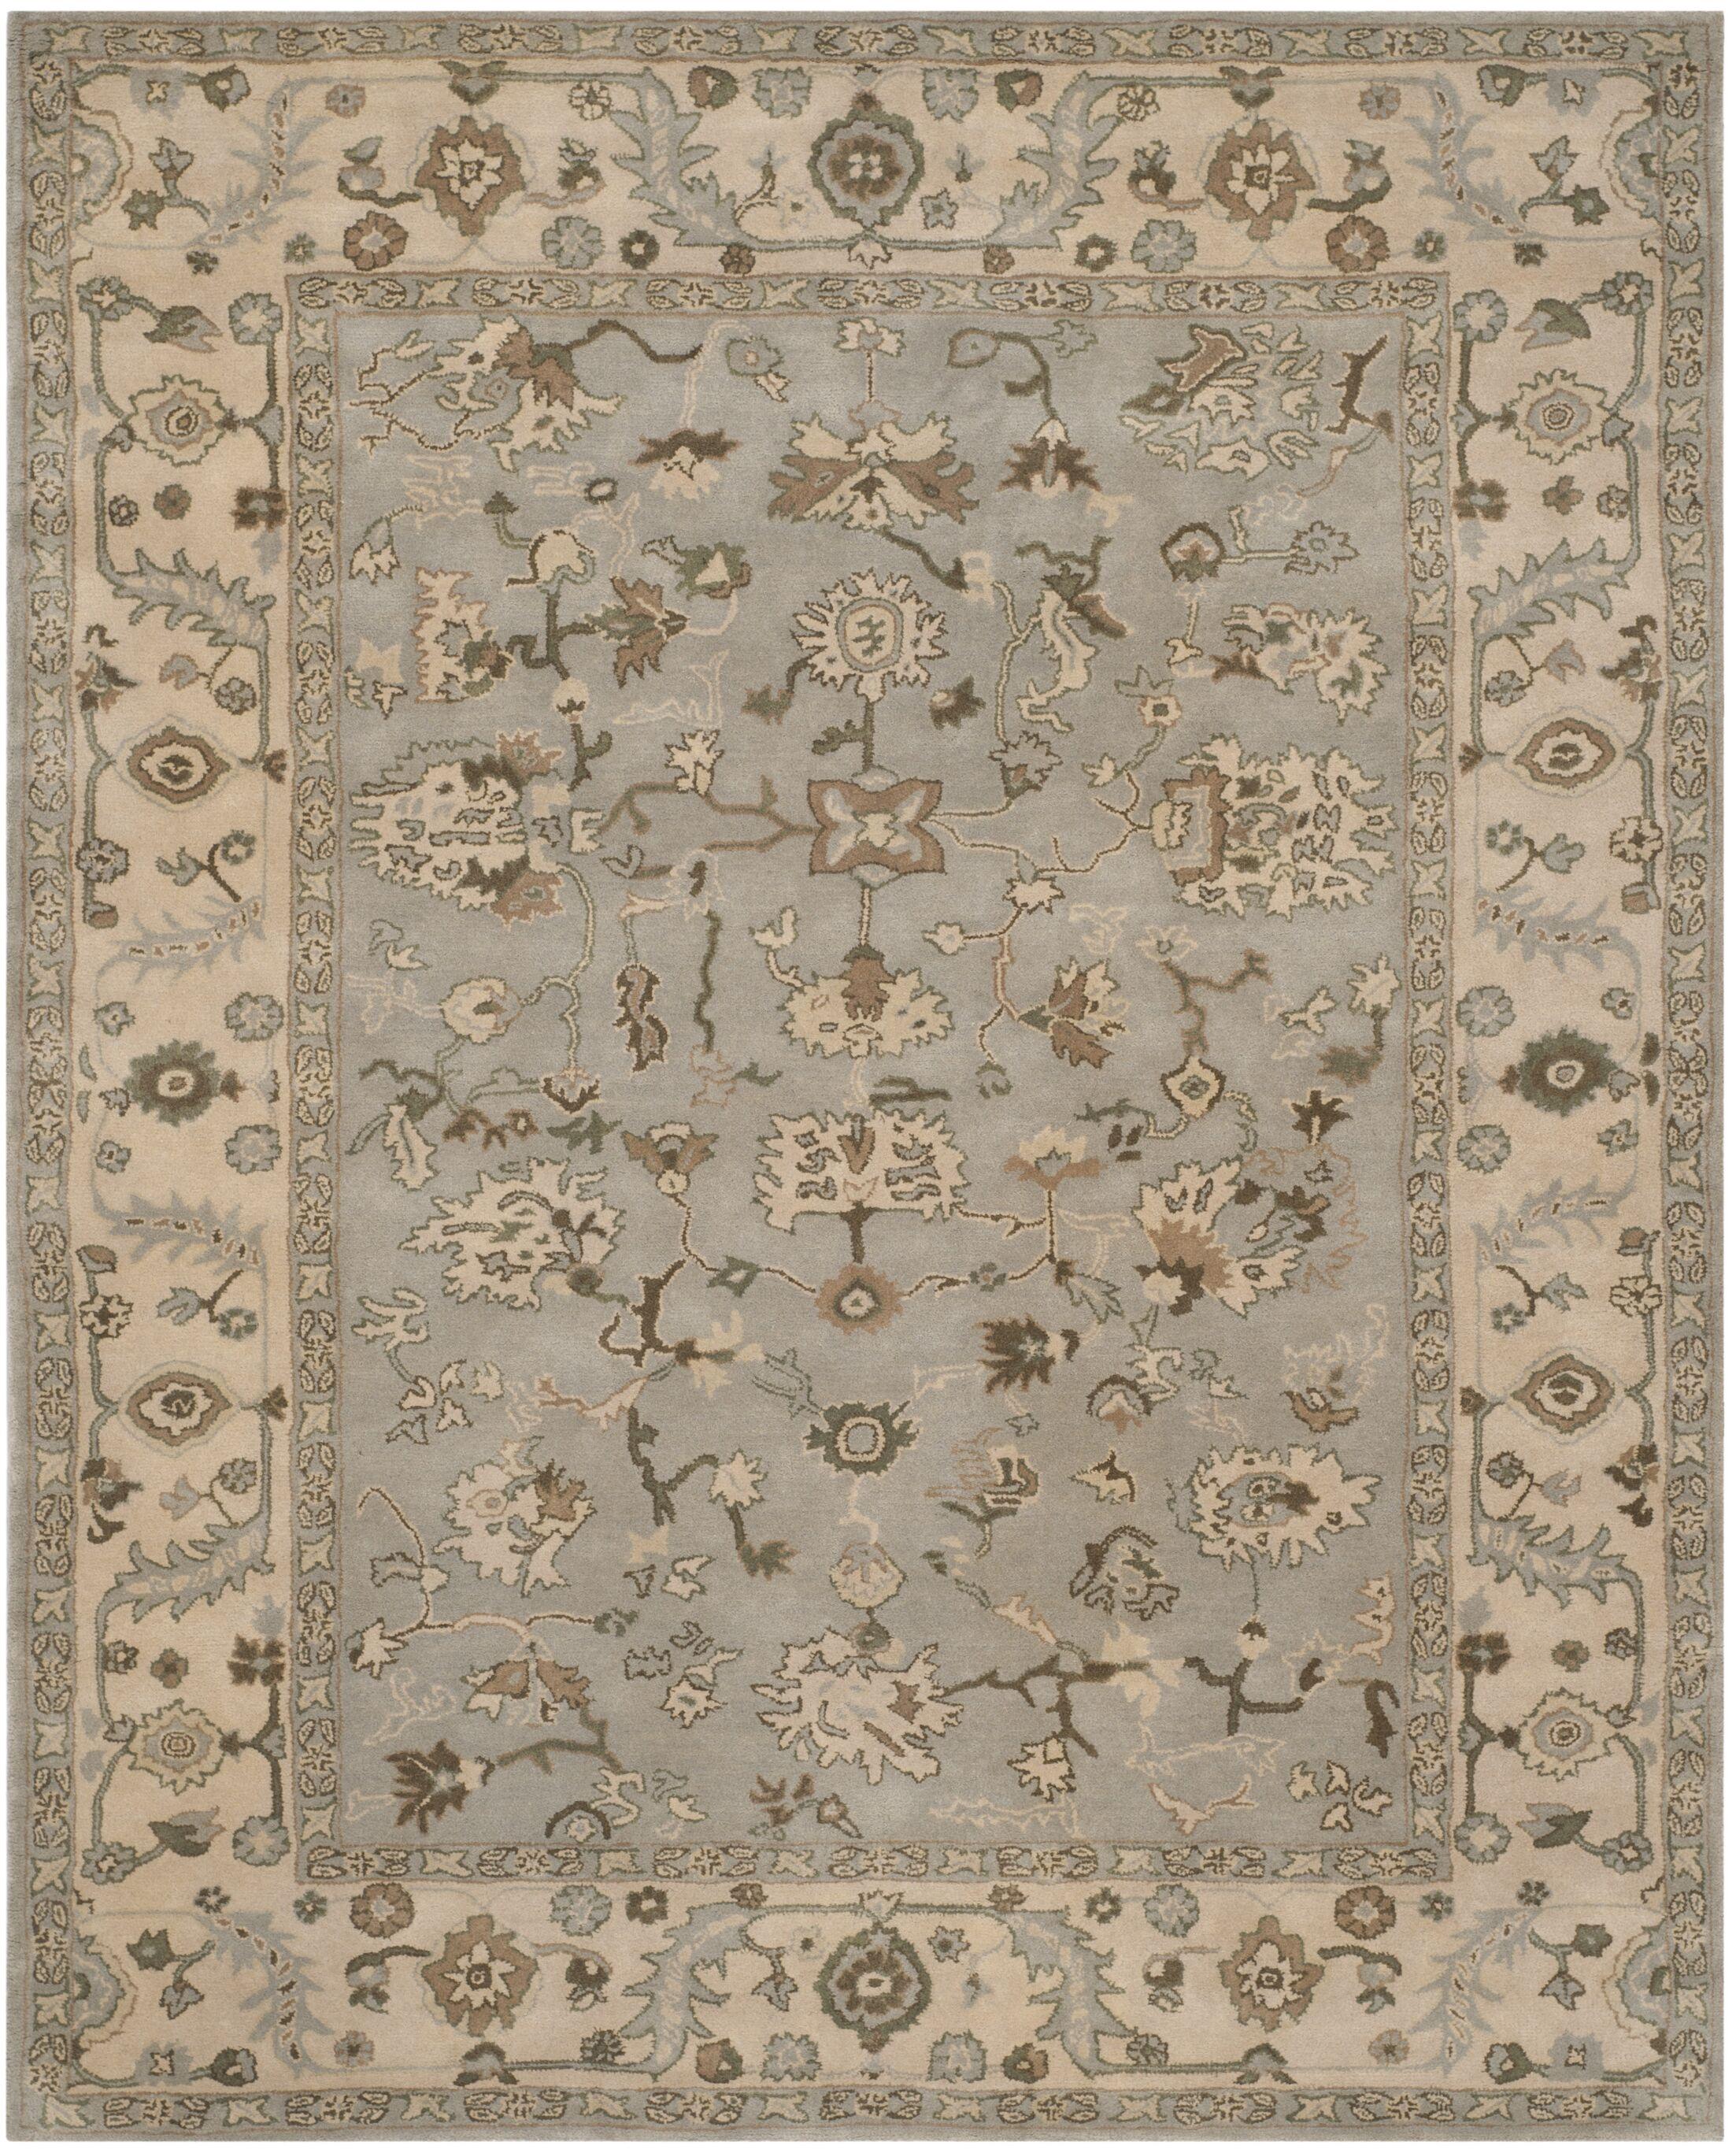 Meriden Hand-Woven Wool Beige/Grey Area Rug Rug Size: Round 6'